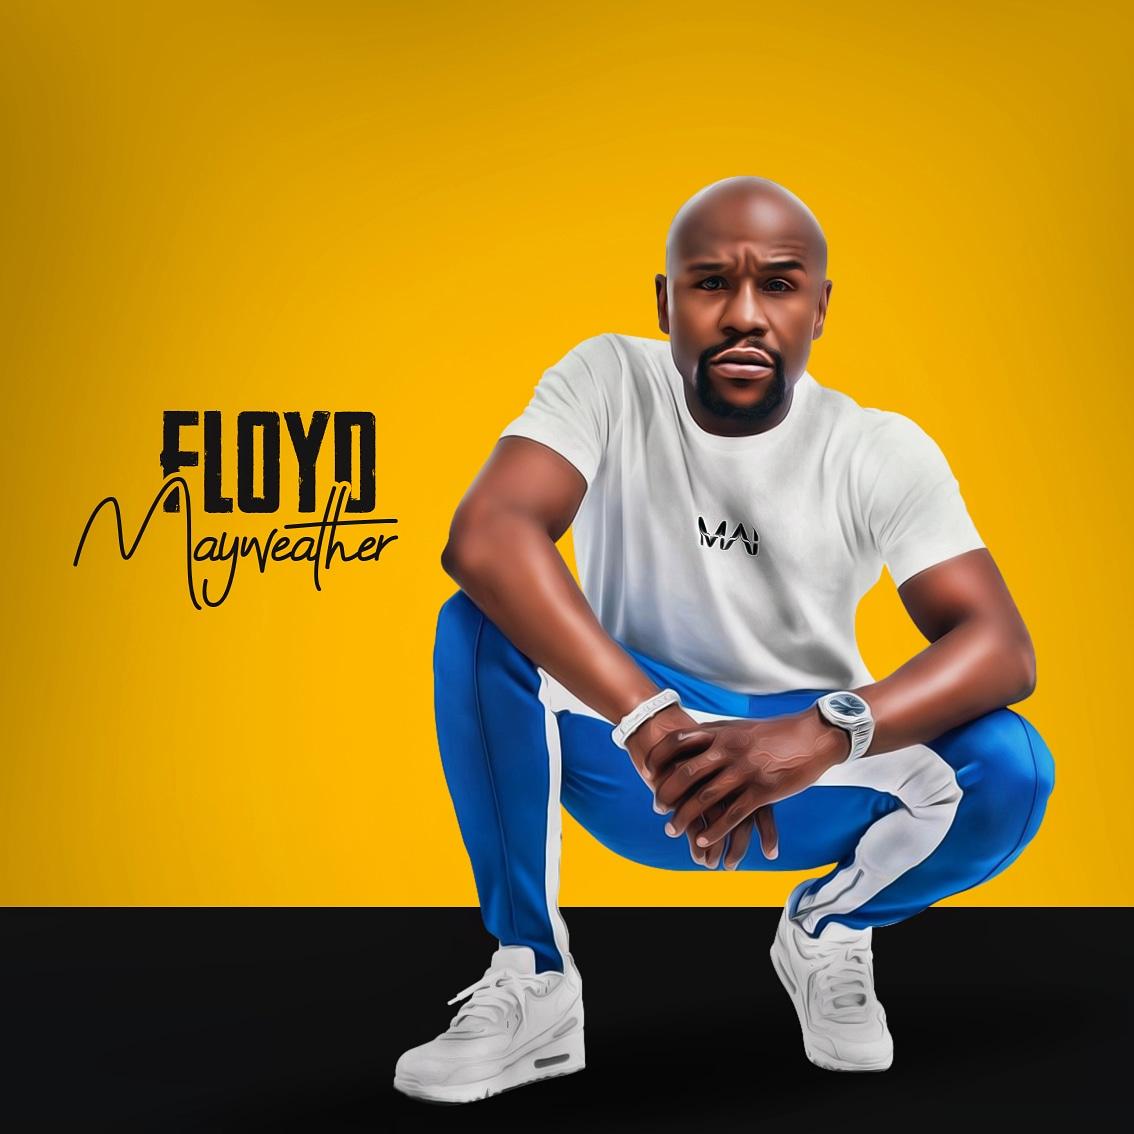 FLOYD EDITION  . . . #tmt #themoneyteam #mayweather #floyd #floydmayweather  @FloydMayweather @rmg1 @jbling @TheMoneyTeam @moneyyayapic.twitter.com/tEuMC45ID4